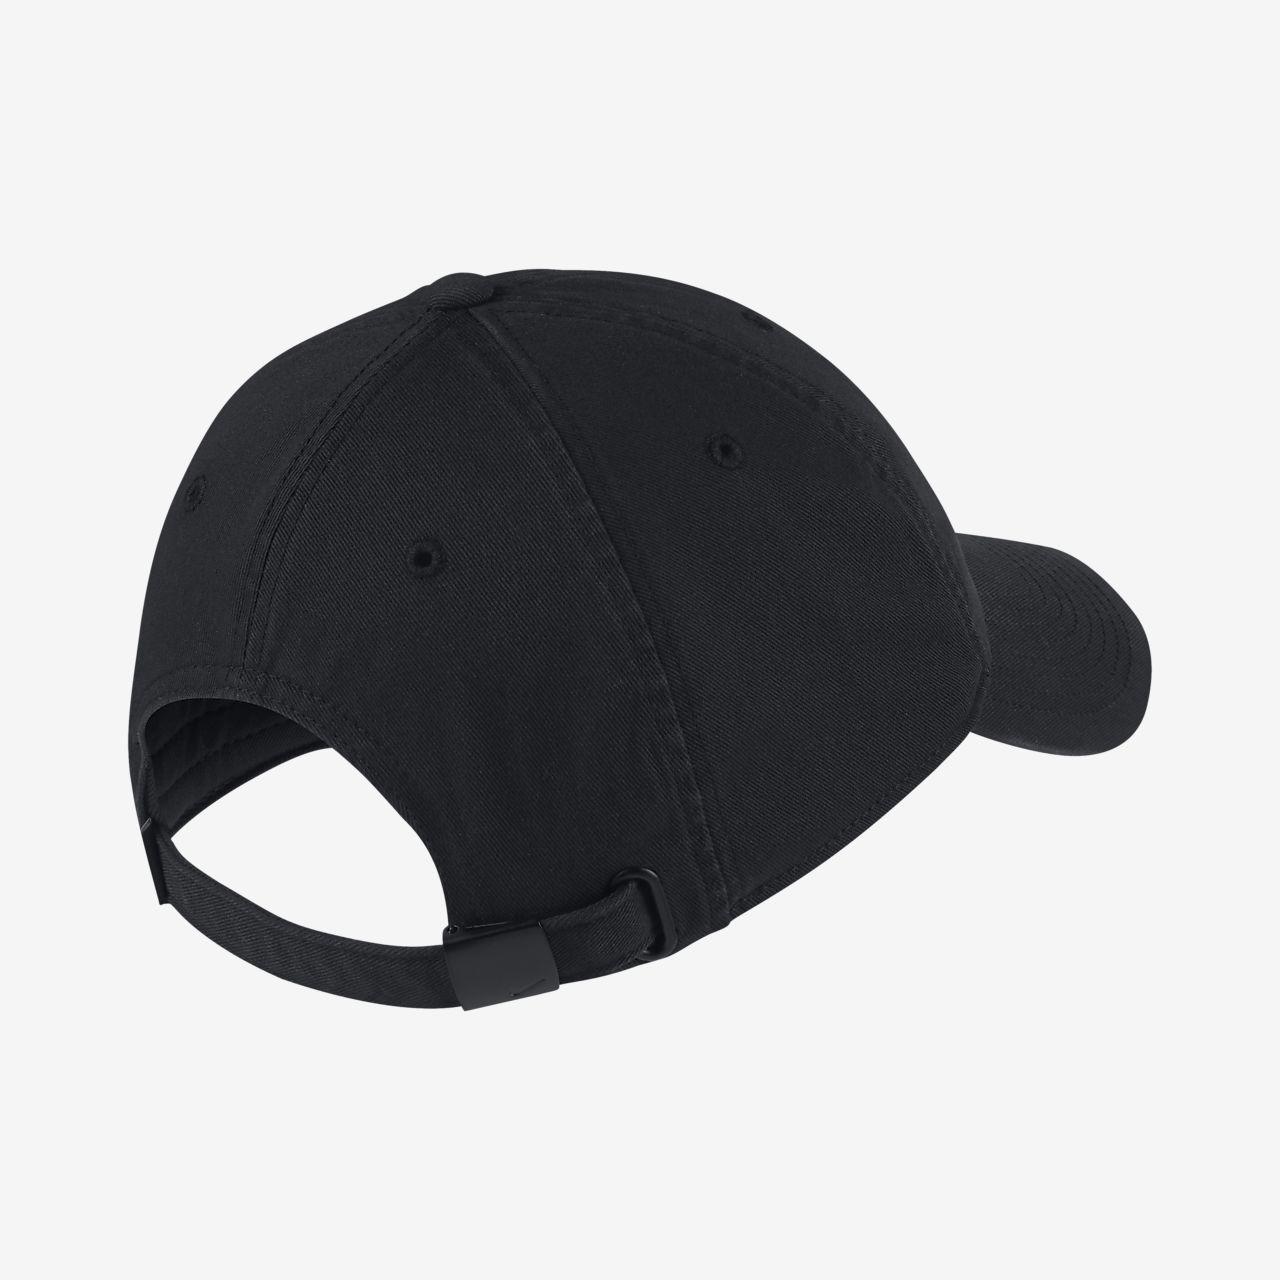 440c7754 Nike Heritage86 Golf Hat. Nike.com